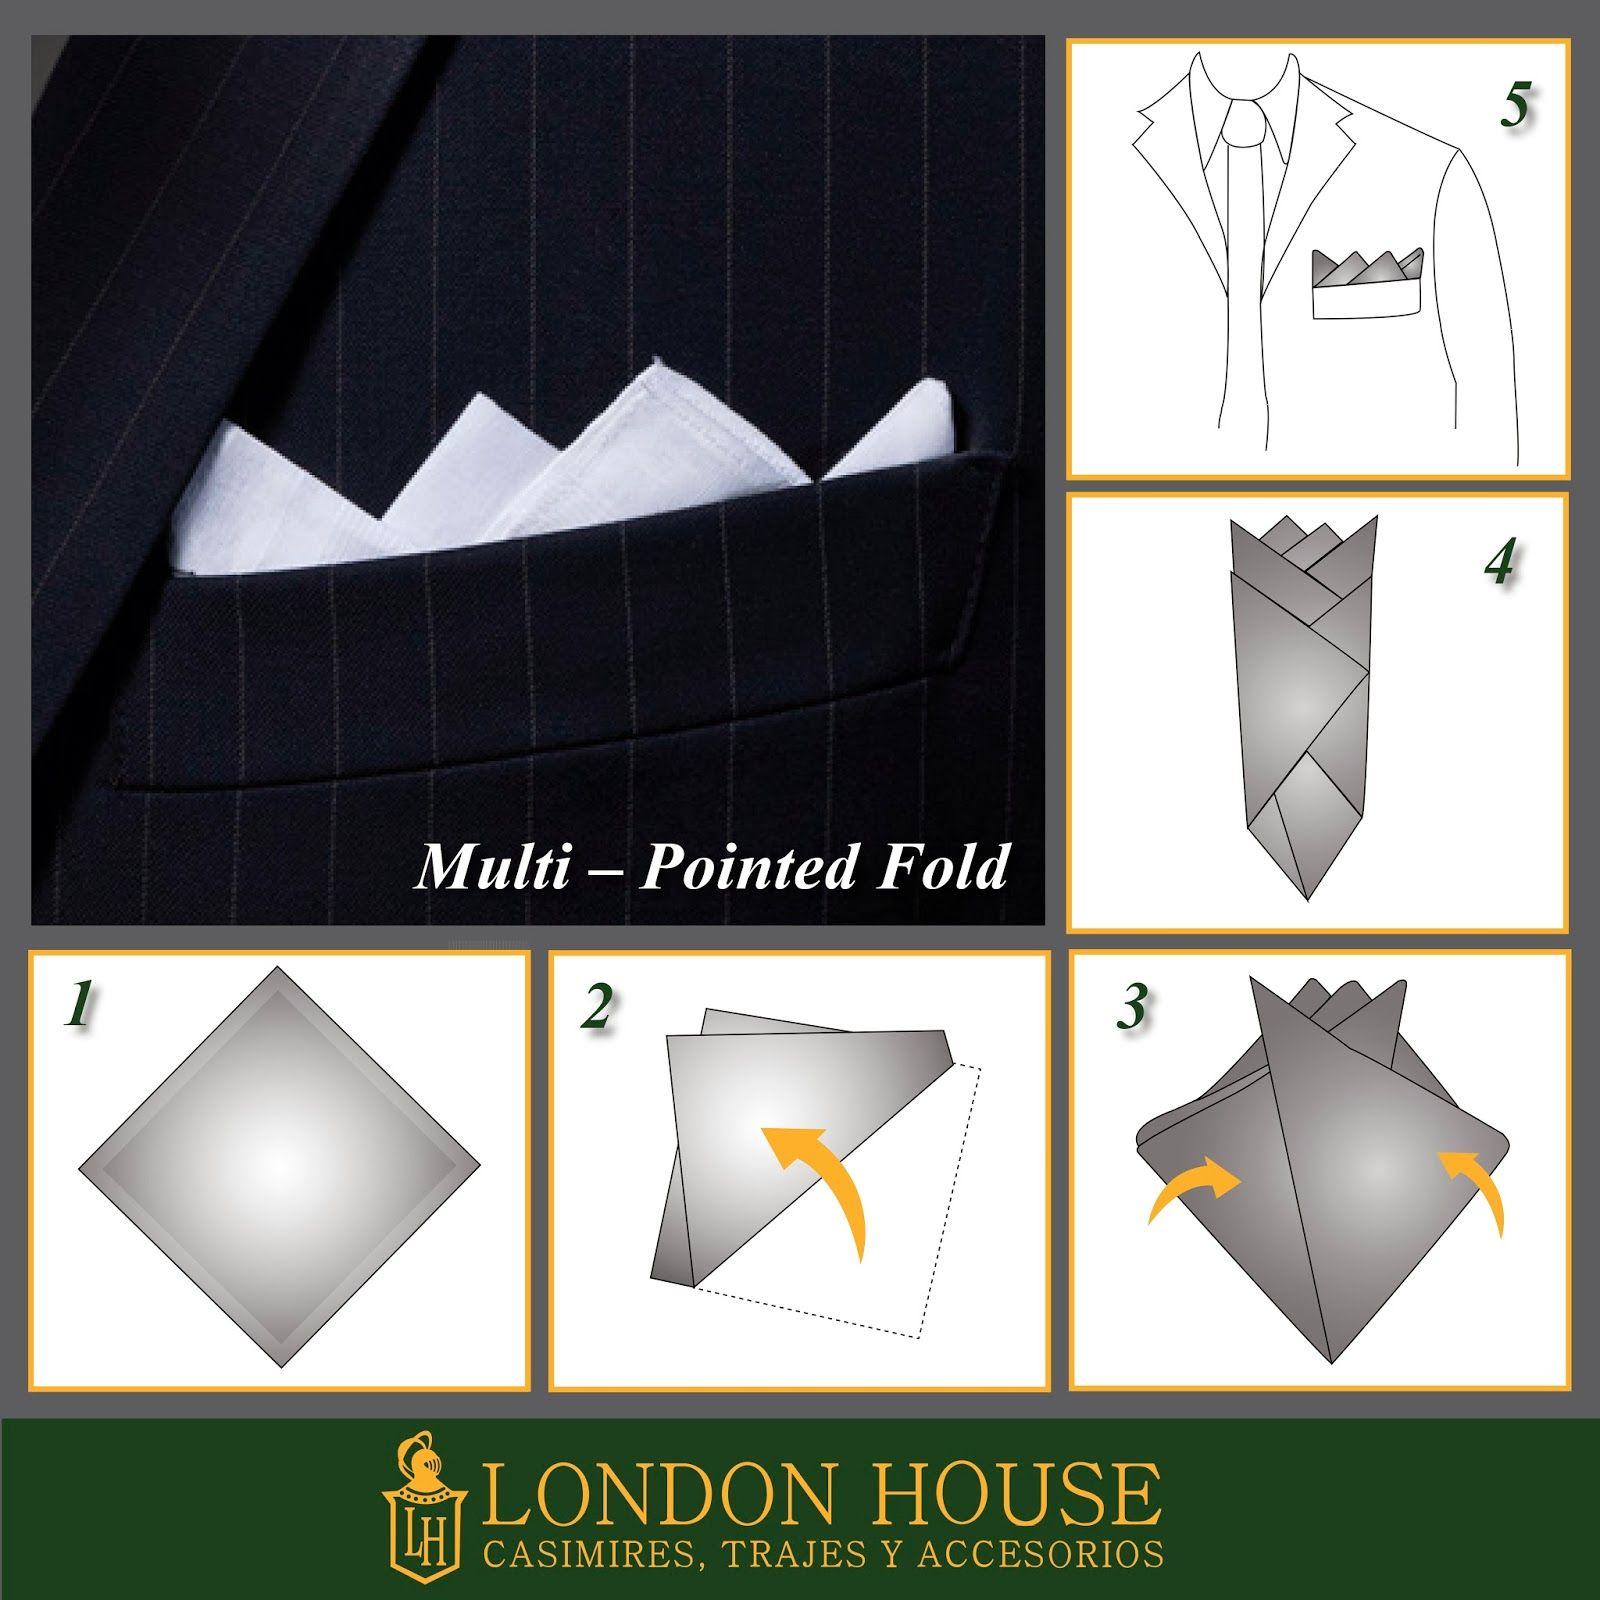 Trajes de Novio y Ternos London House: PAÑUELO, DOBLE MULTI-POINTED ...